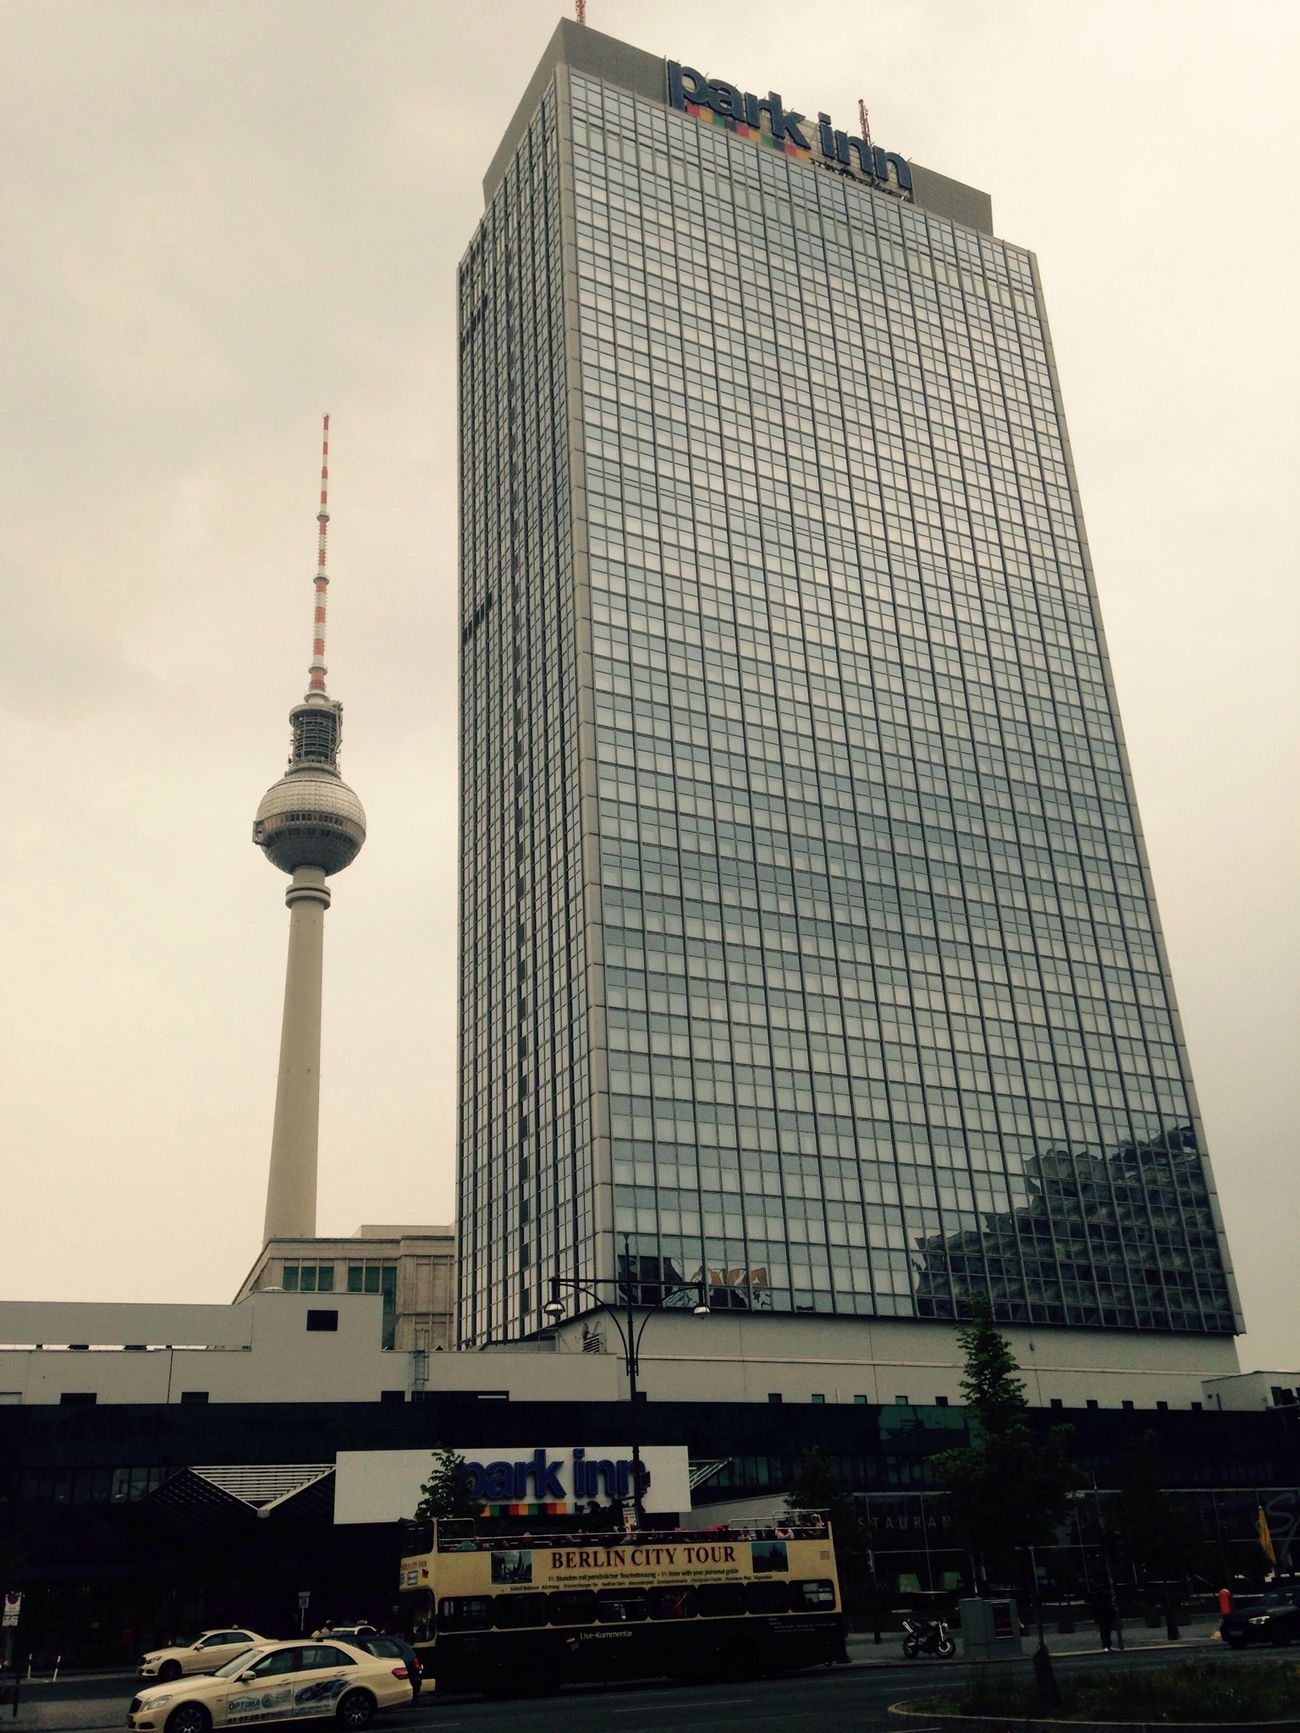 Berlin 's tallest building/ Hotel with Fernsehturm in the background. I ❤ BERLIN My Fuckin Berlin Berliner Ansichten Berlin Mitte My Berlin